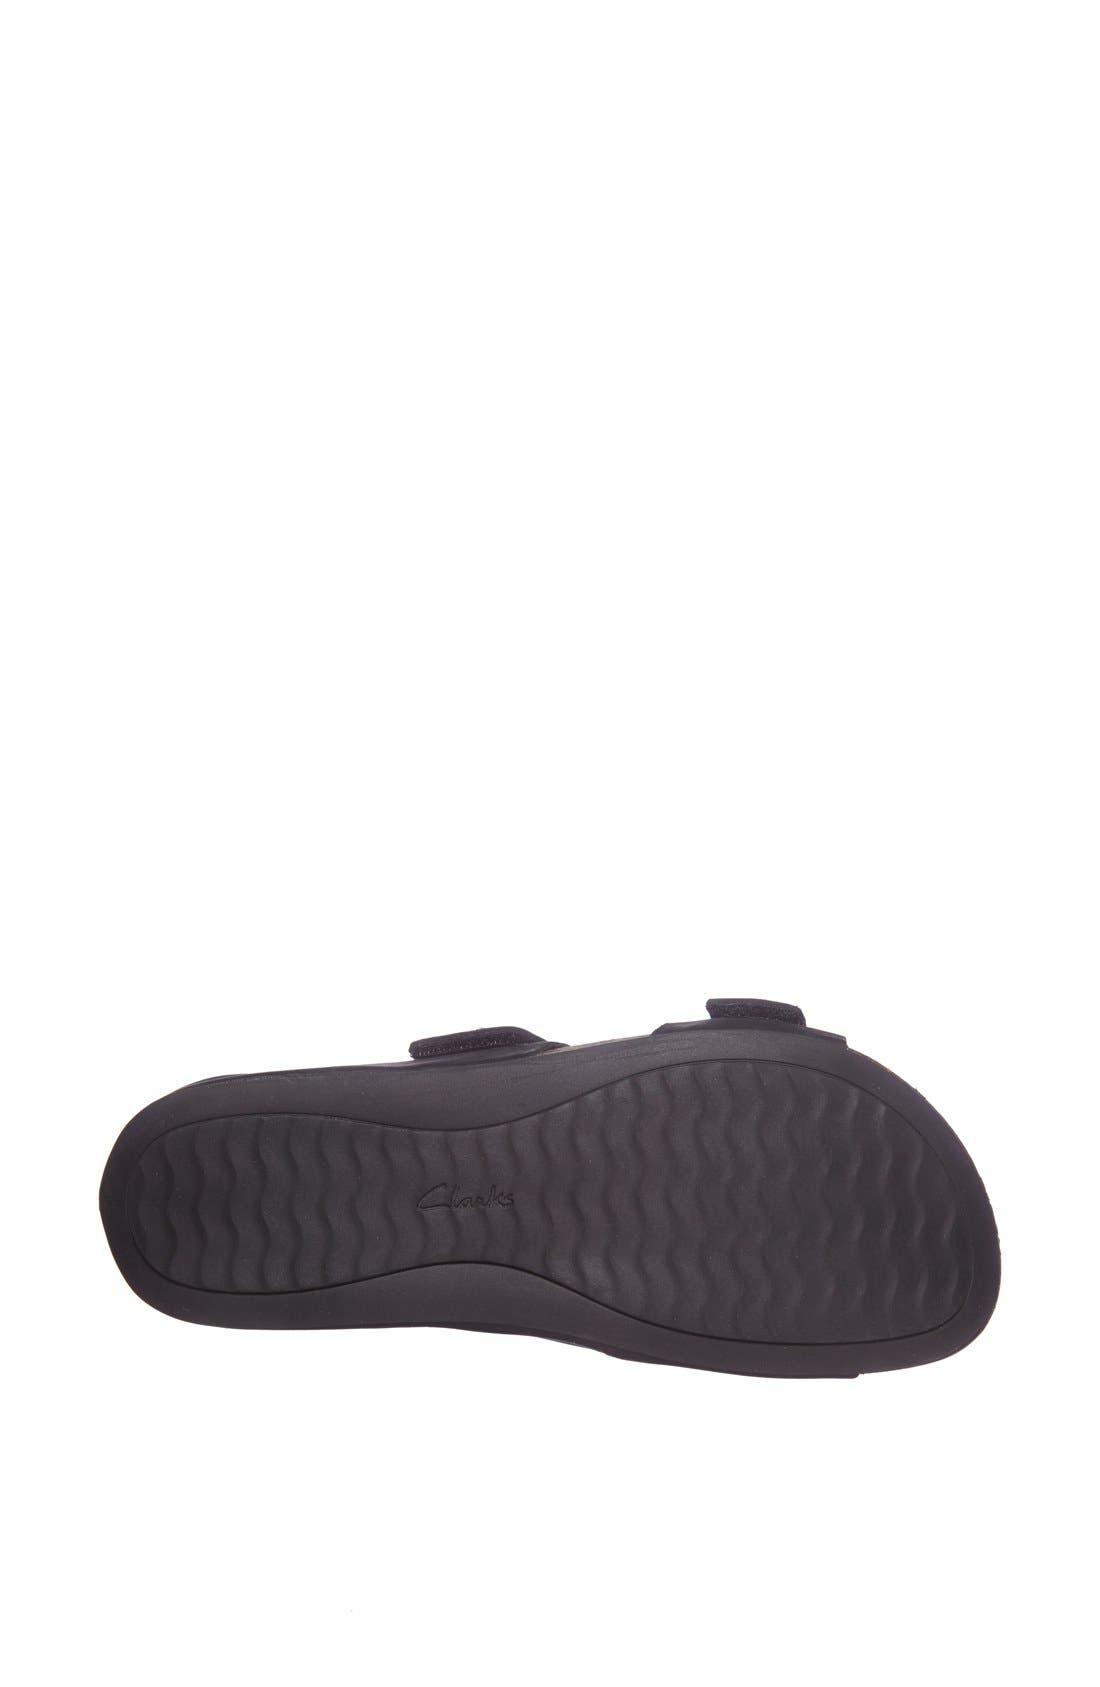 'Perri Coast' Leather Thong Sandal,                             Alternate thumbnail 3, color,                             005